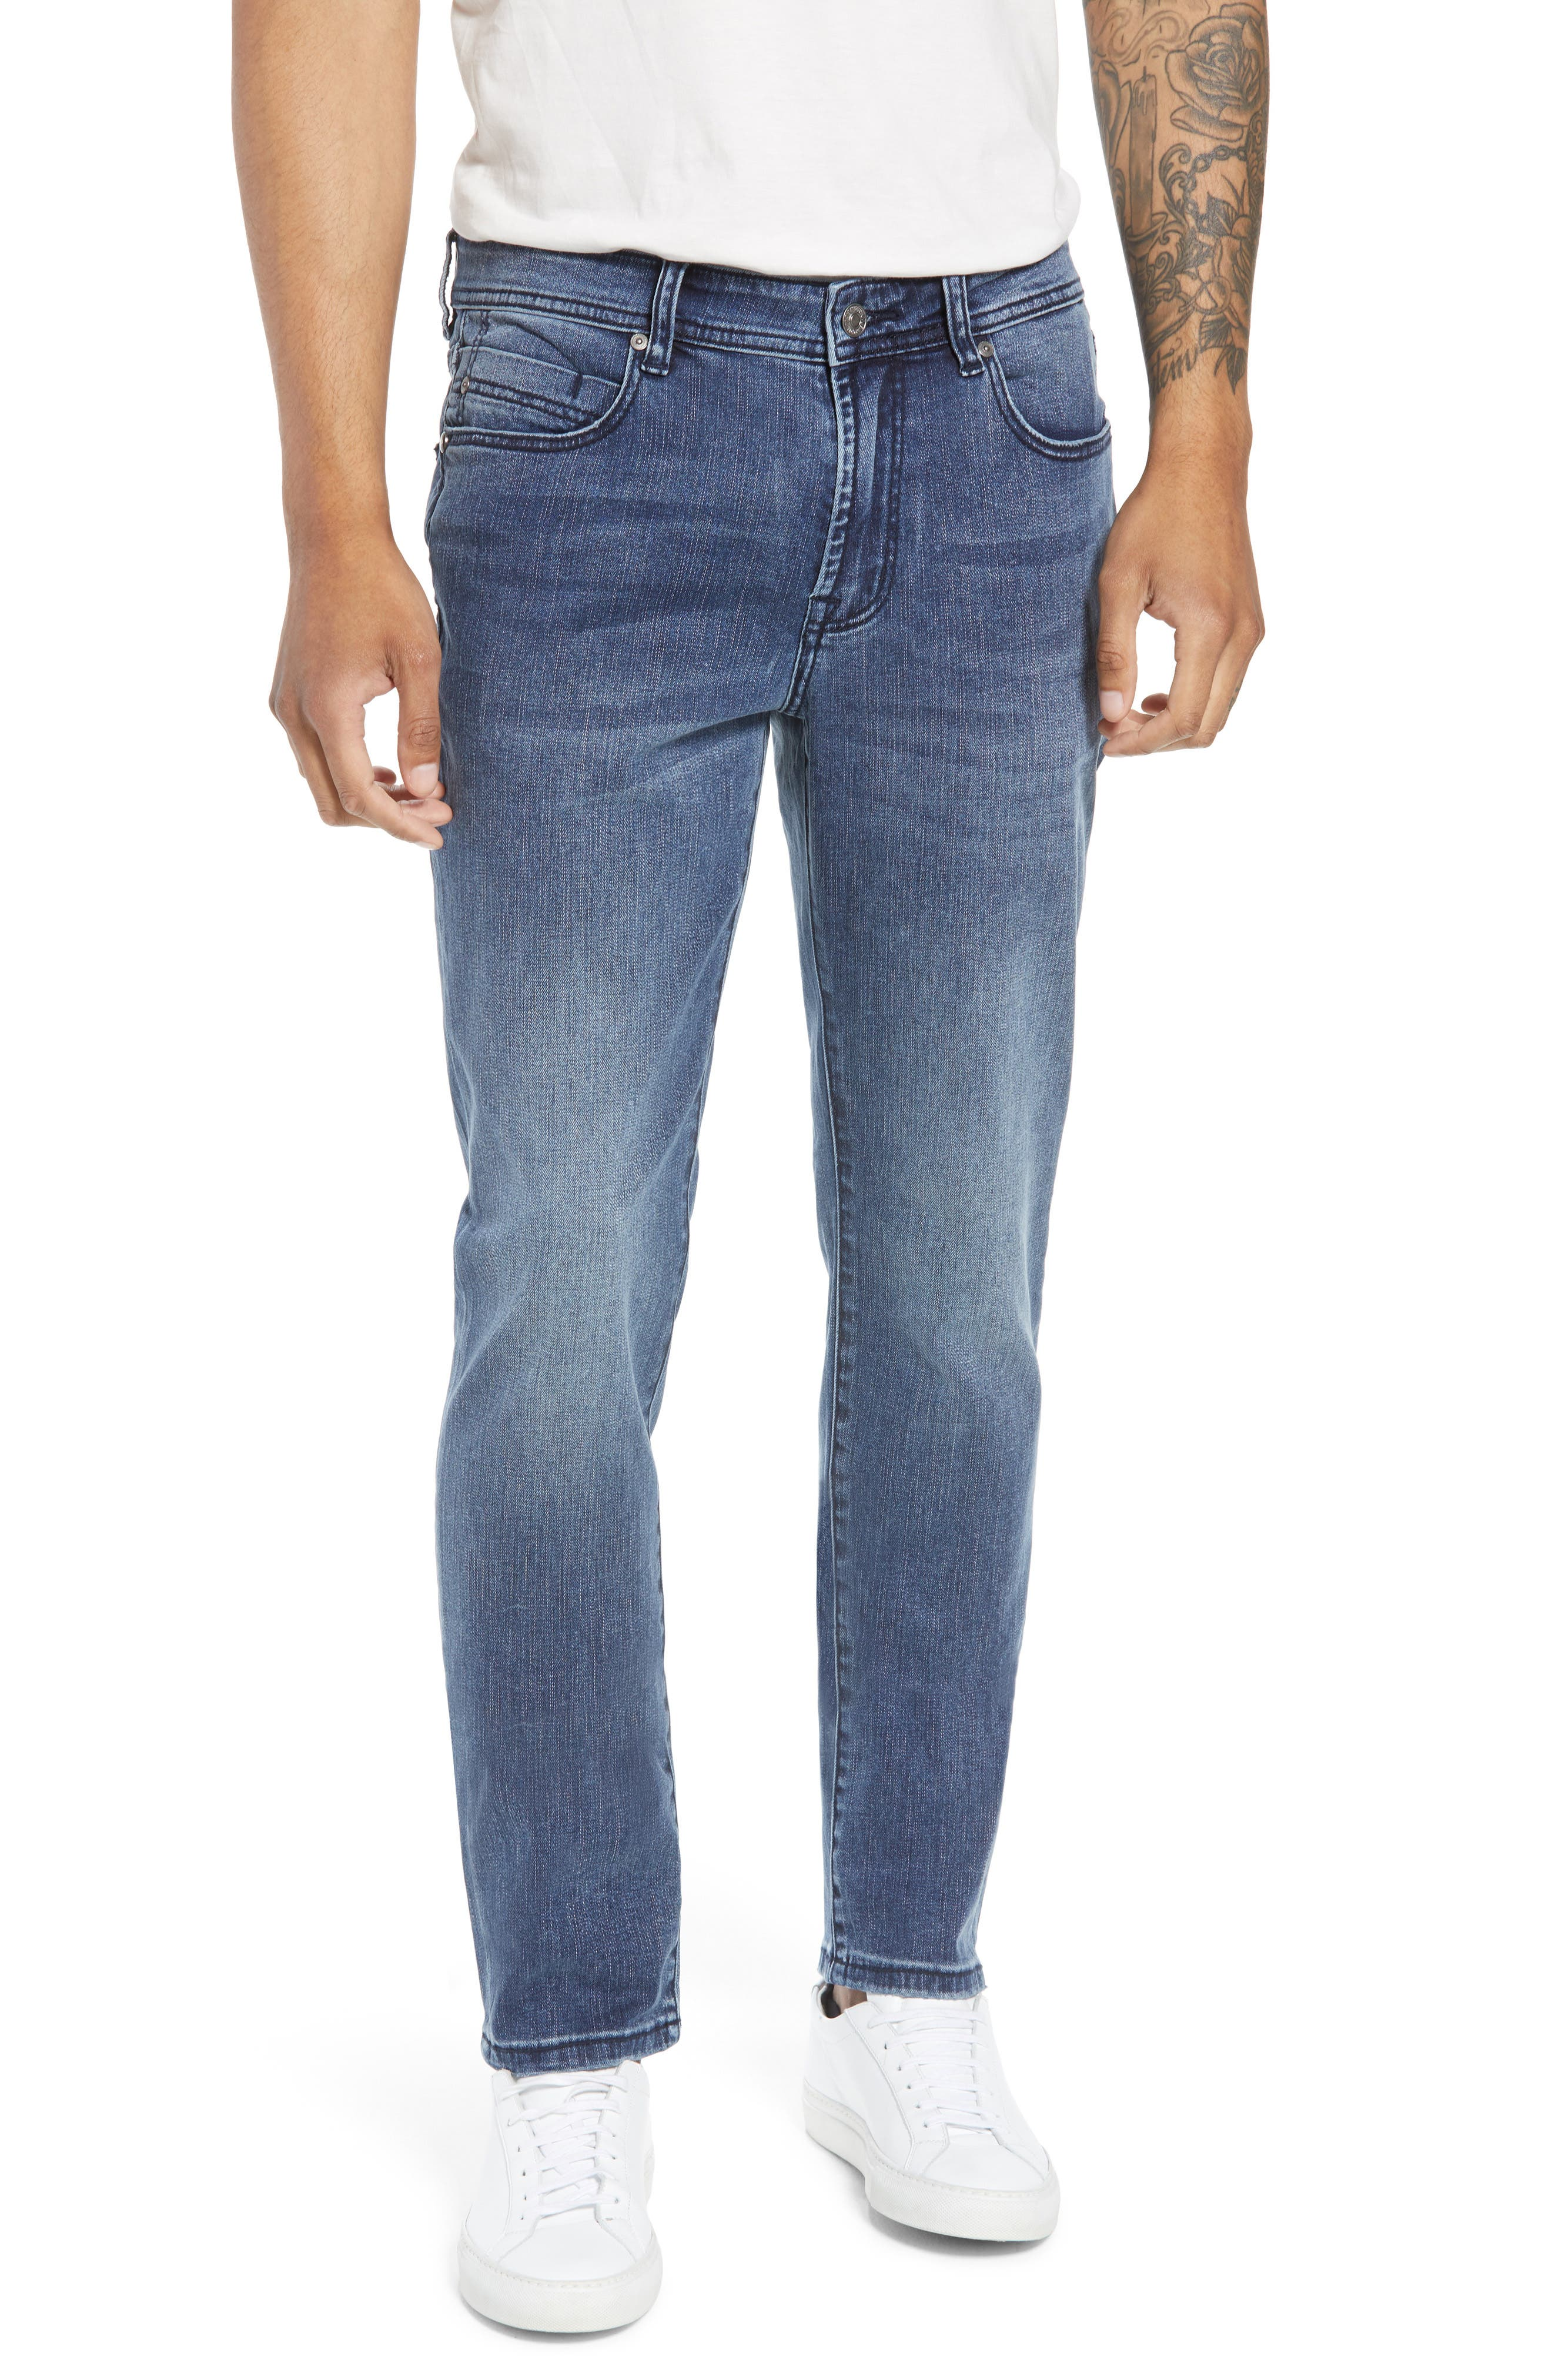 Jeans Co. Slim Straight Leg Jeans,                         Main,                         color, Southaven Mid Blue